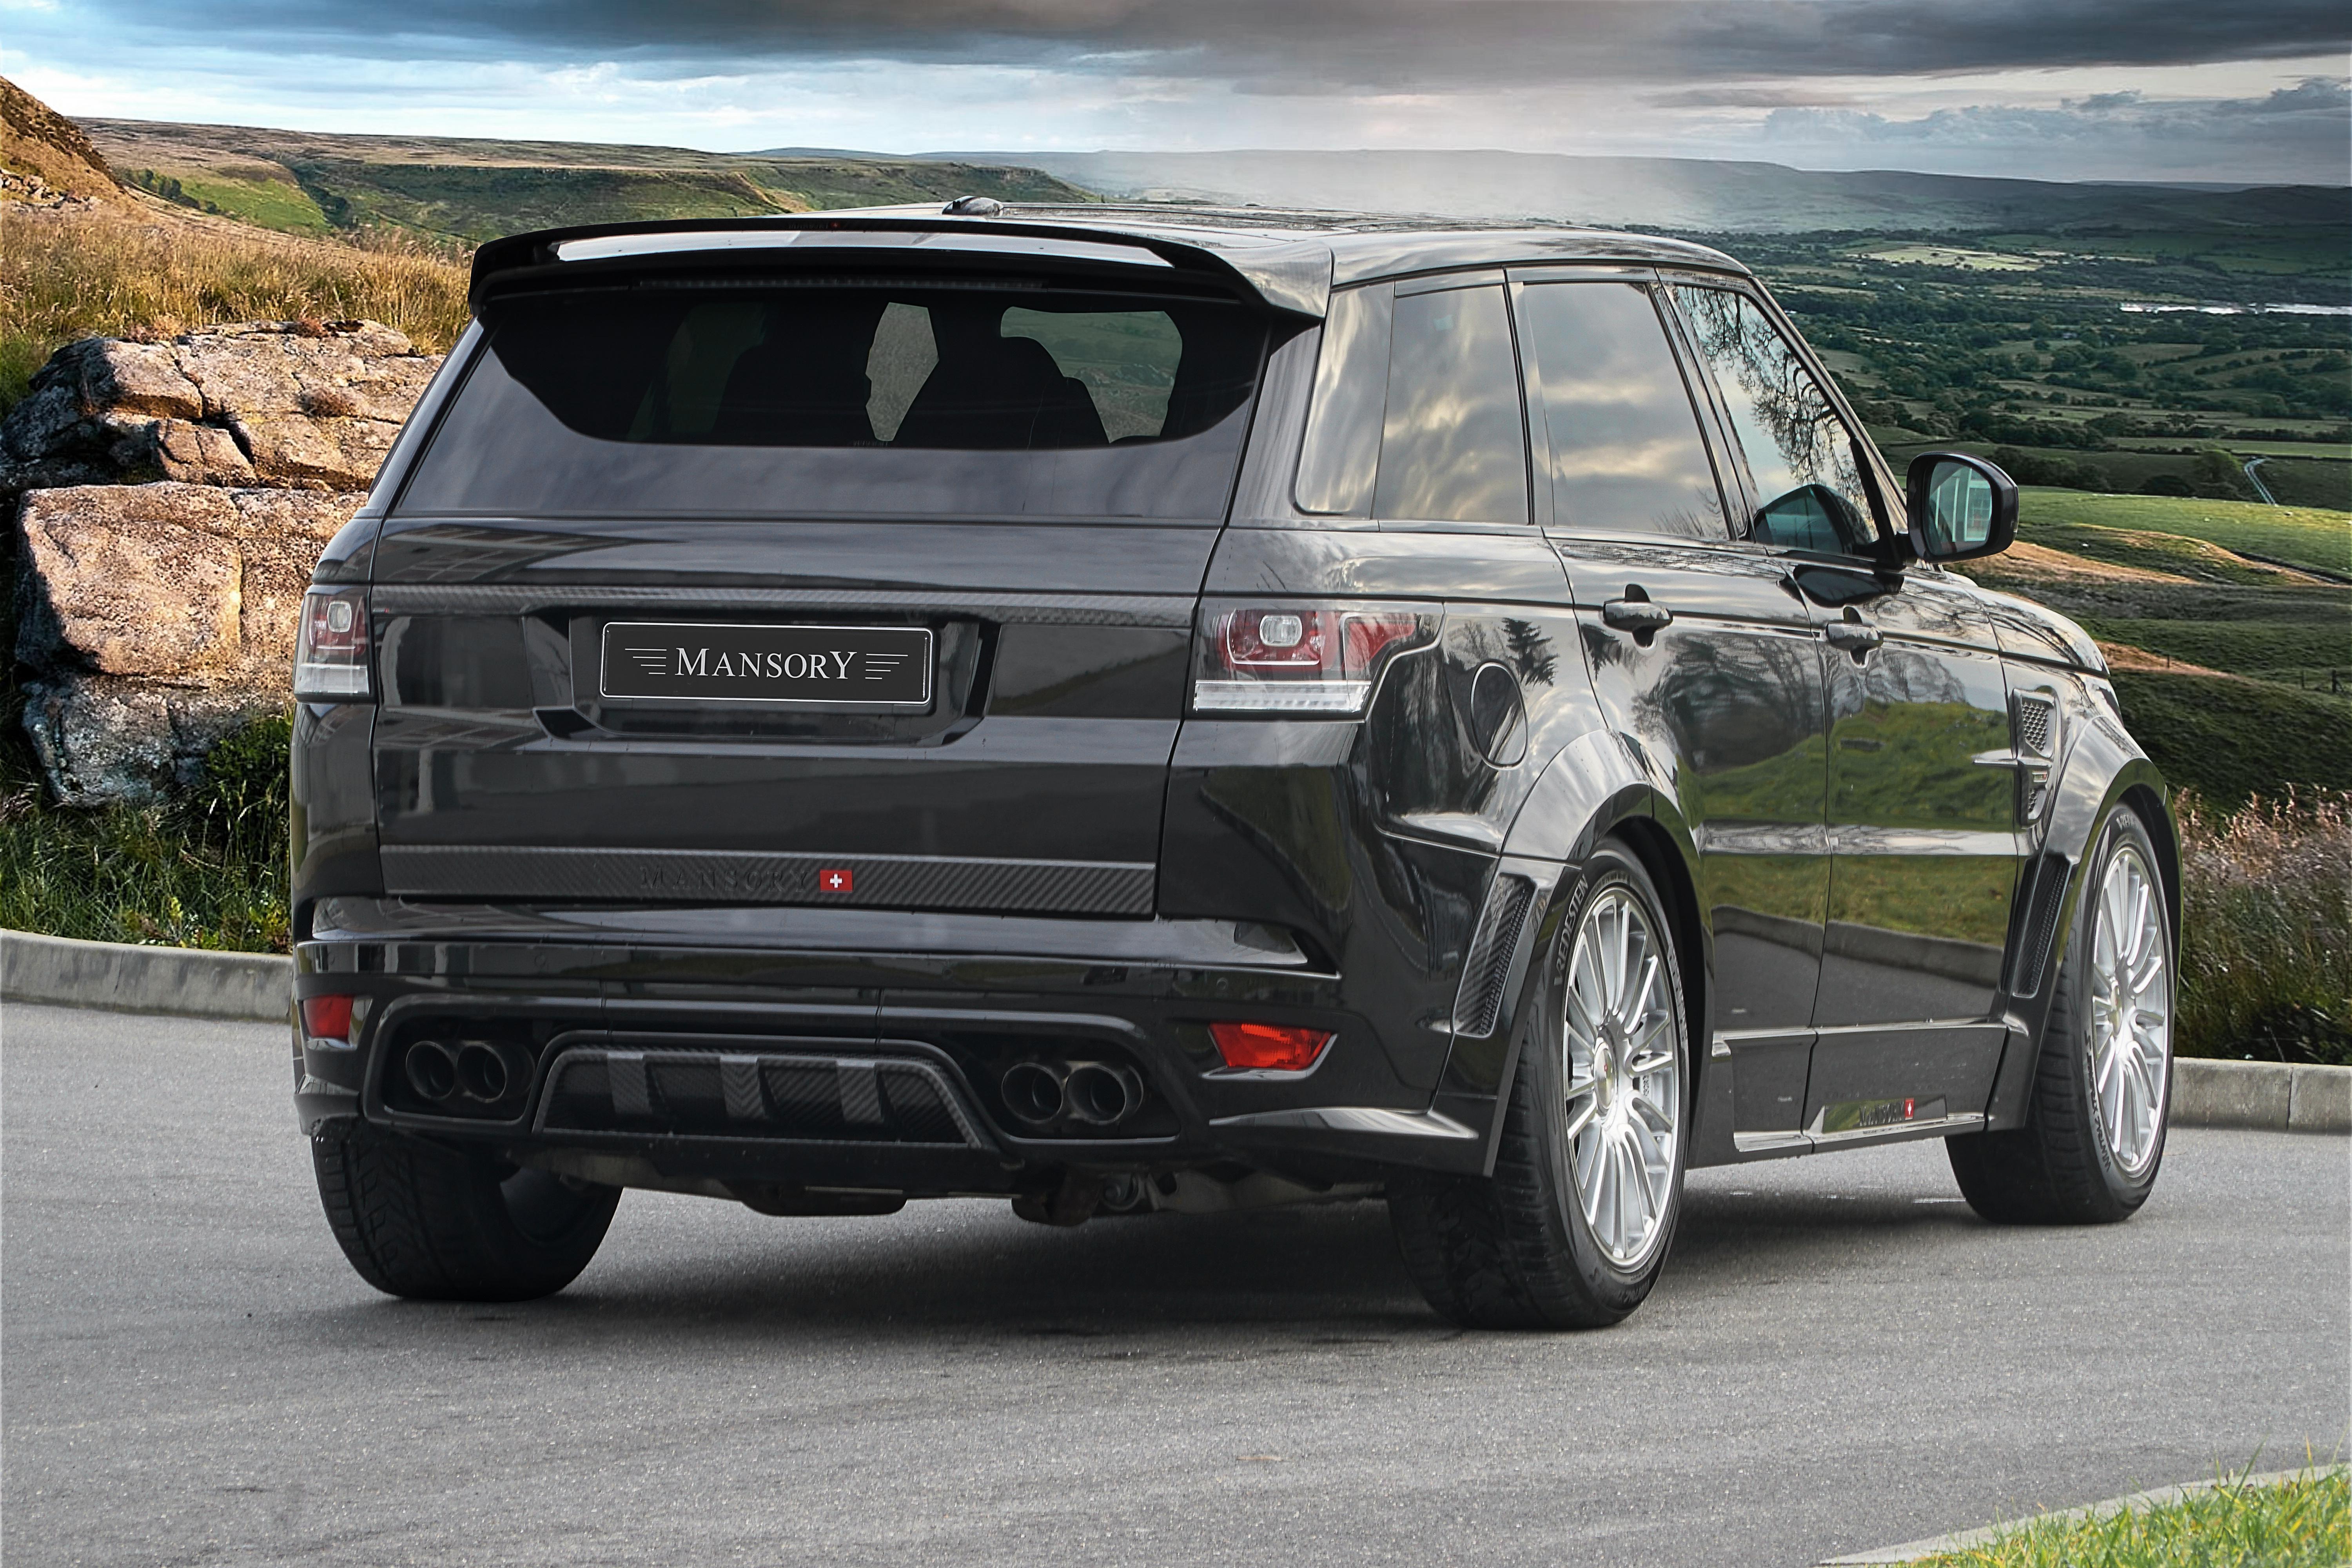 Range Rover Svr Price >> Range Rover Sport Svr Mansory